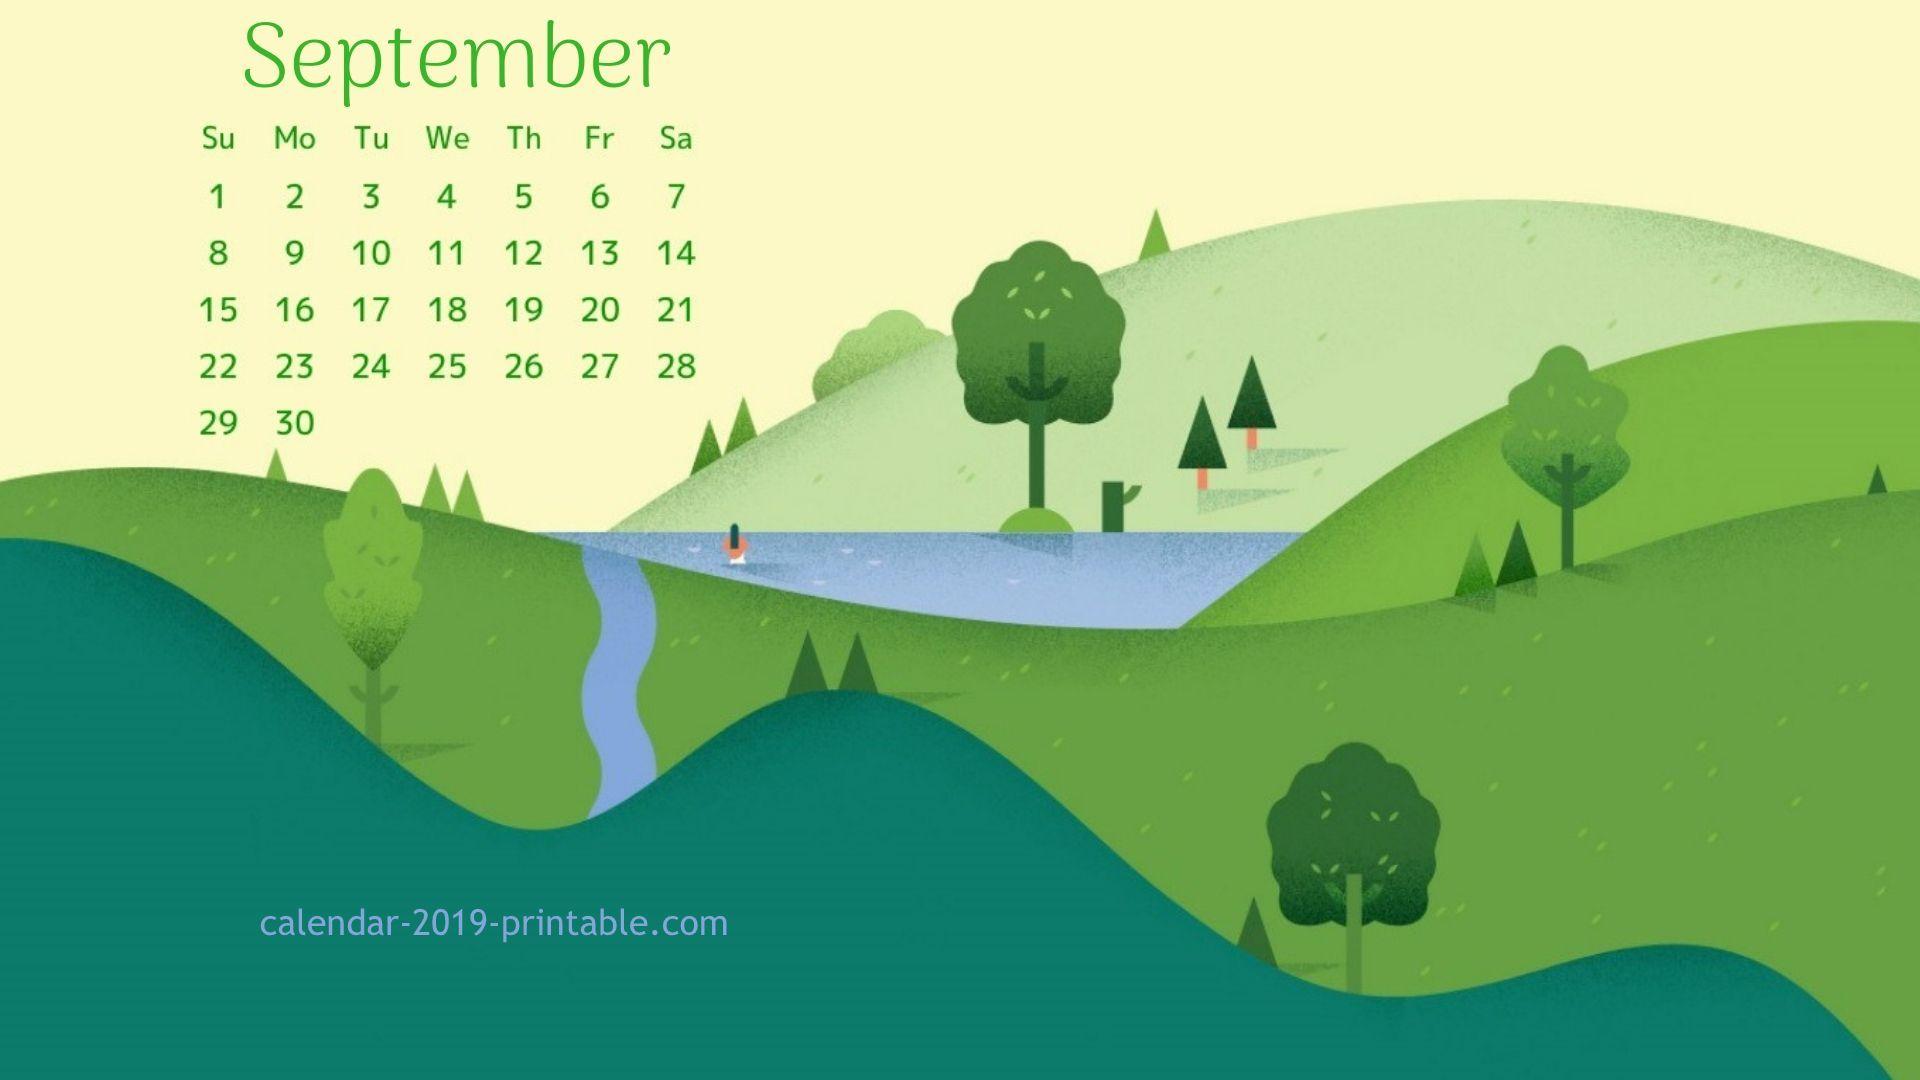 september 2019 calendar beautiful wallpaper in 2019 Desktop 1920x1080